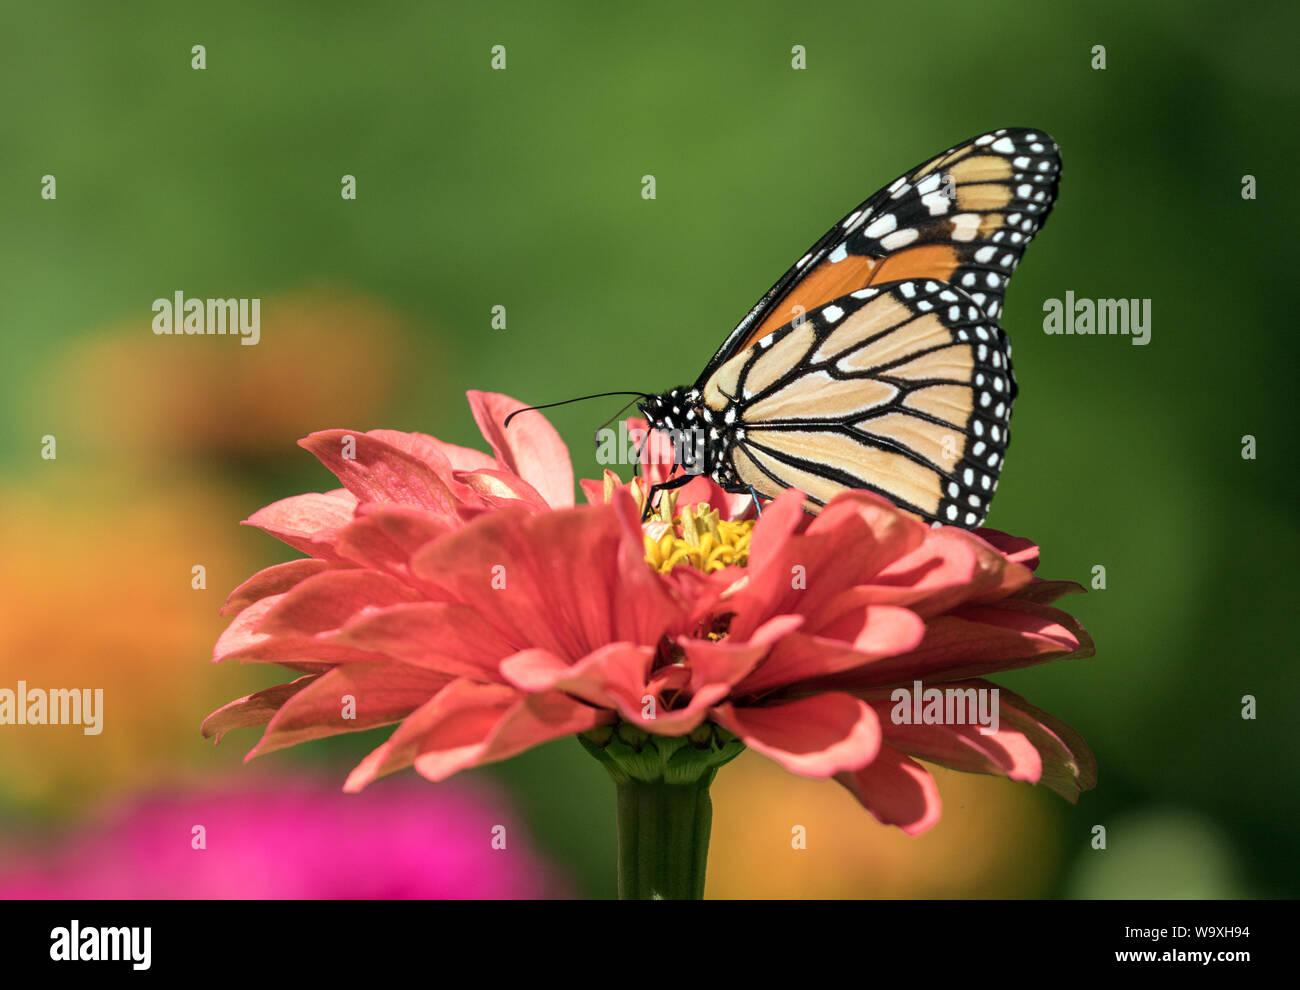 Closeup of Monarch Butterfly ( Danaus plexippus) taking nectar from Zinnia flower. Stock Photo